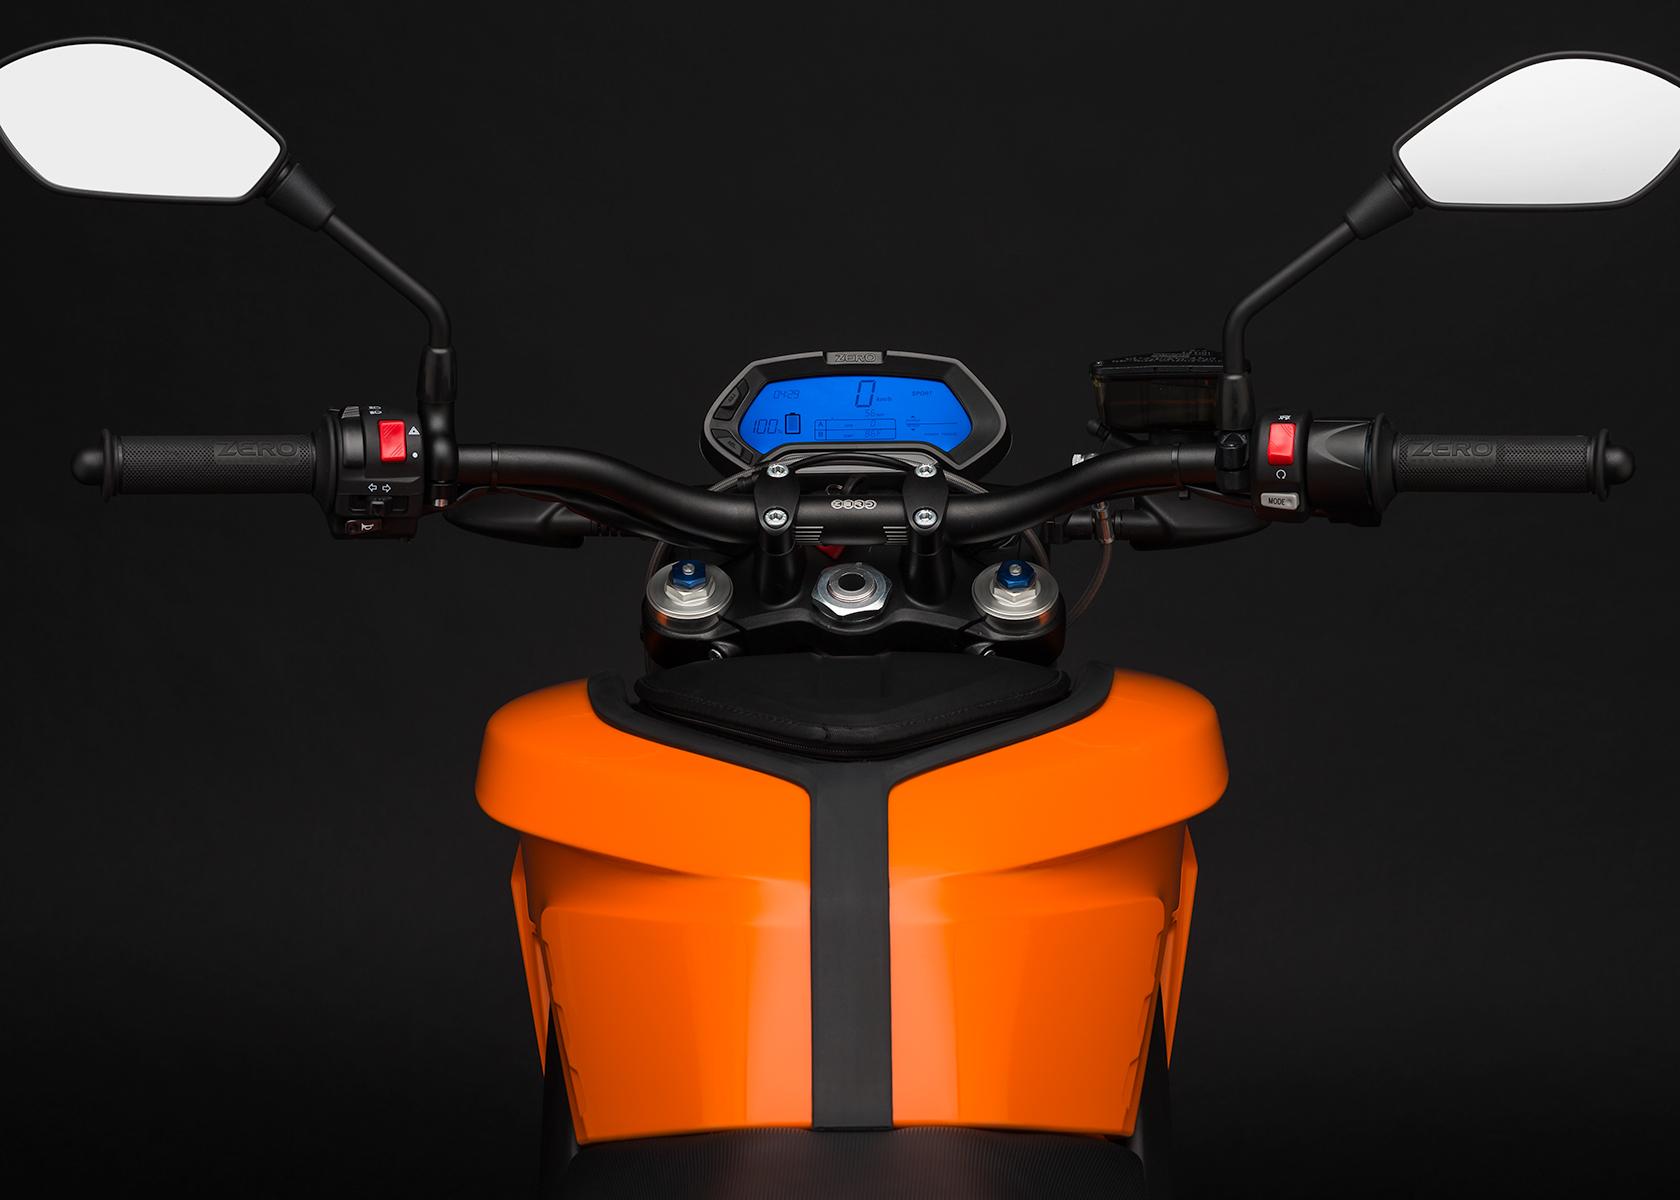 2015 Zero DS Electric Motorcycle: Dash